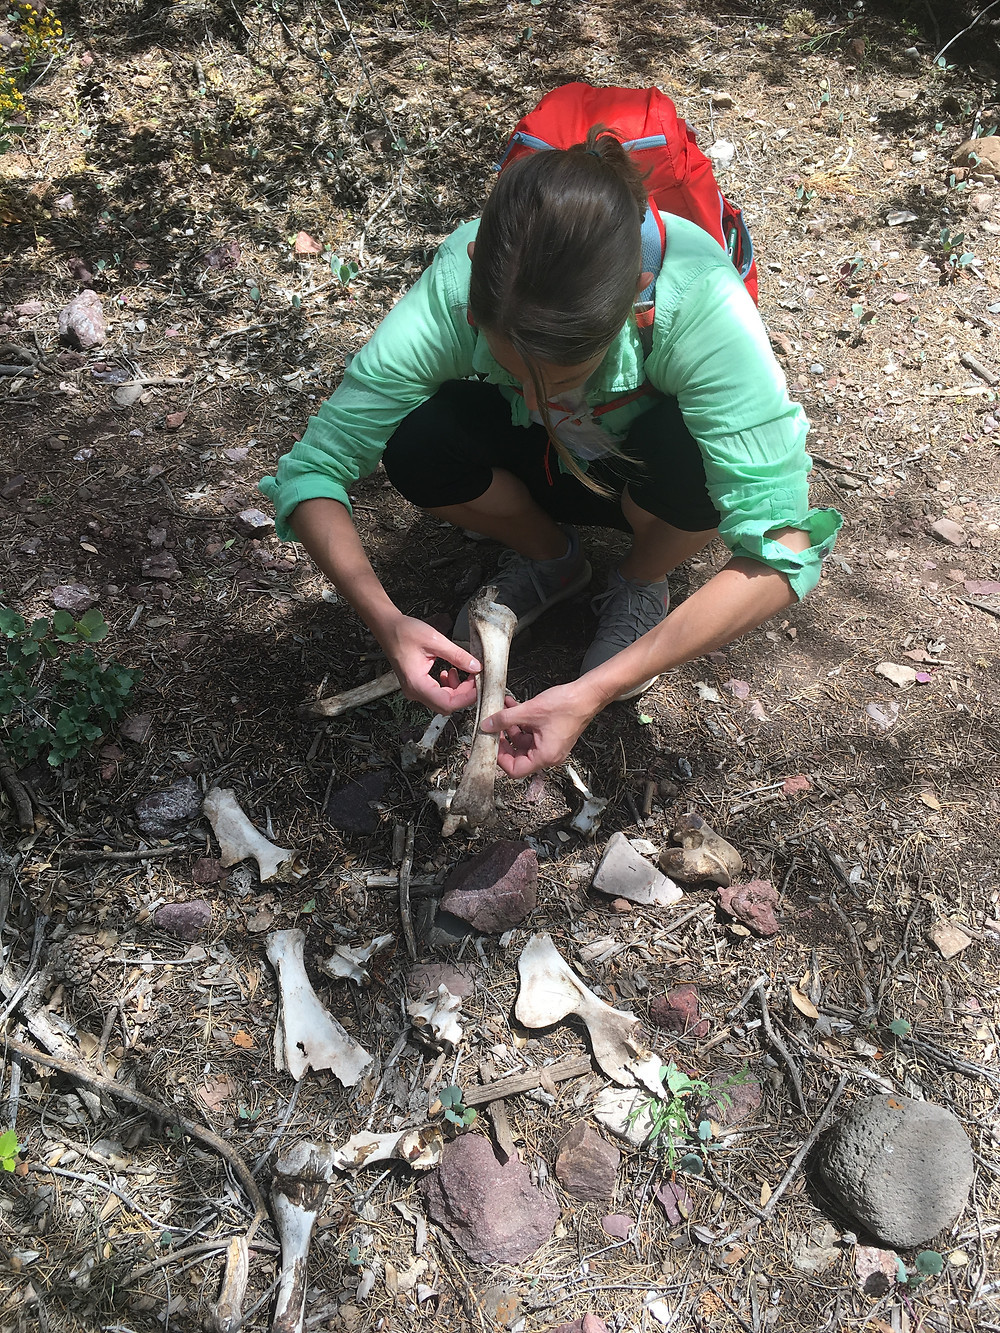 My examining some animal bones while on a hike in Arizona